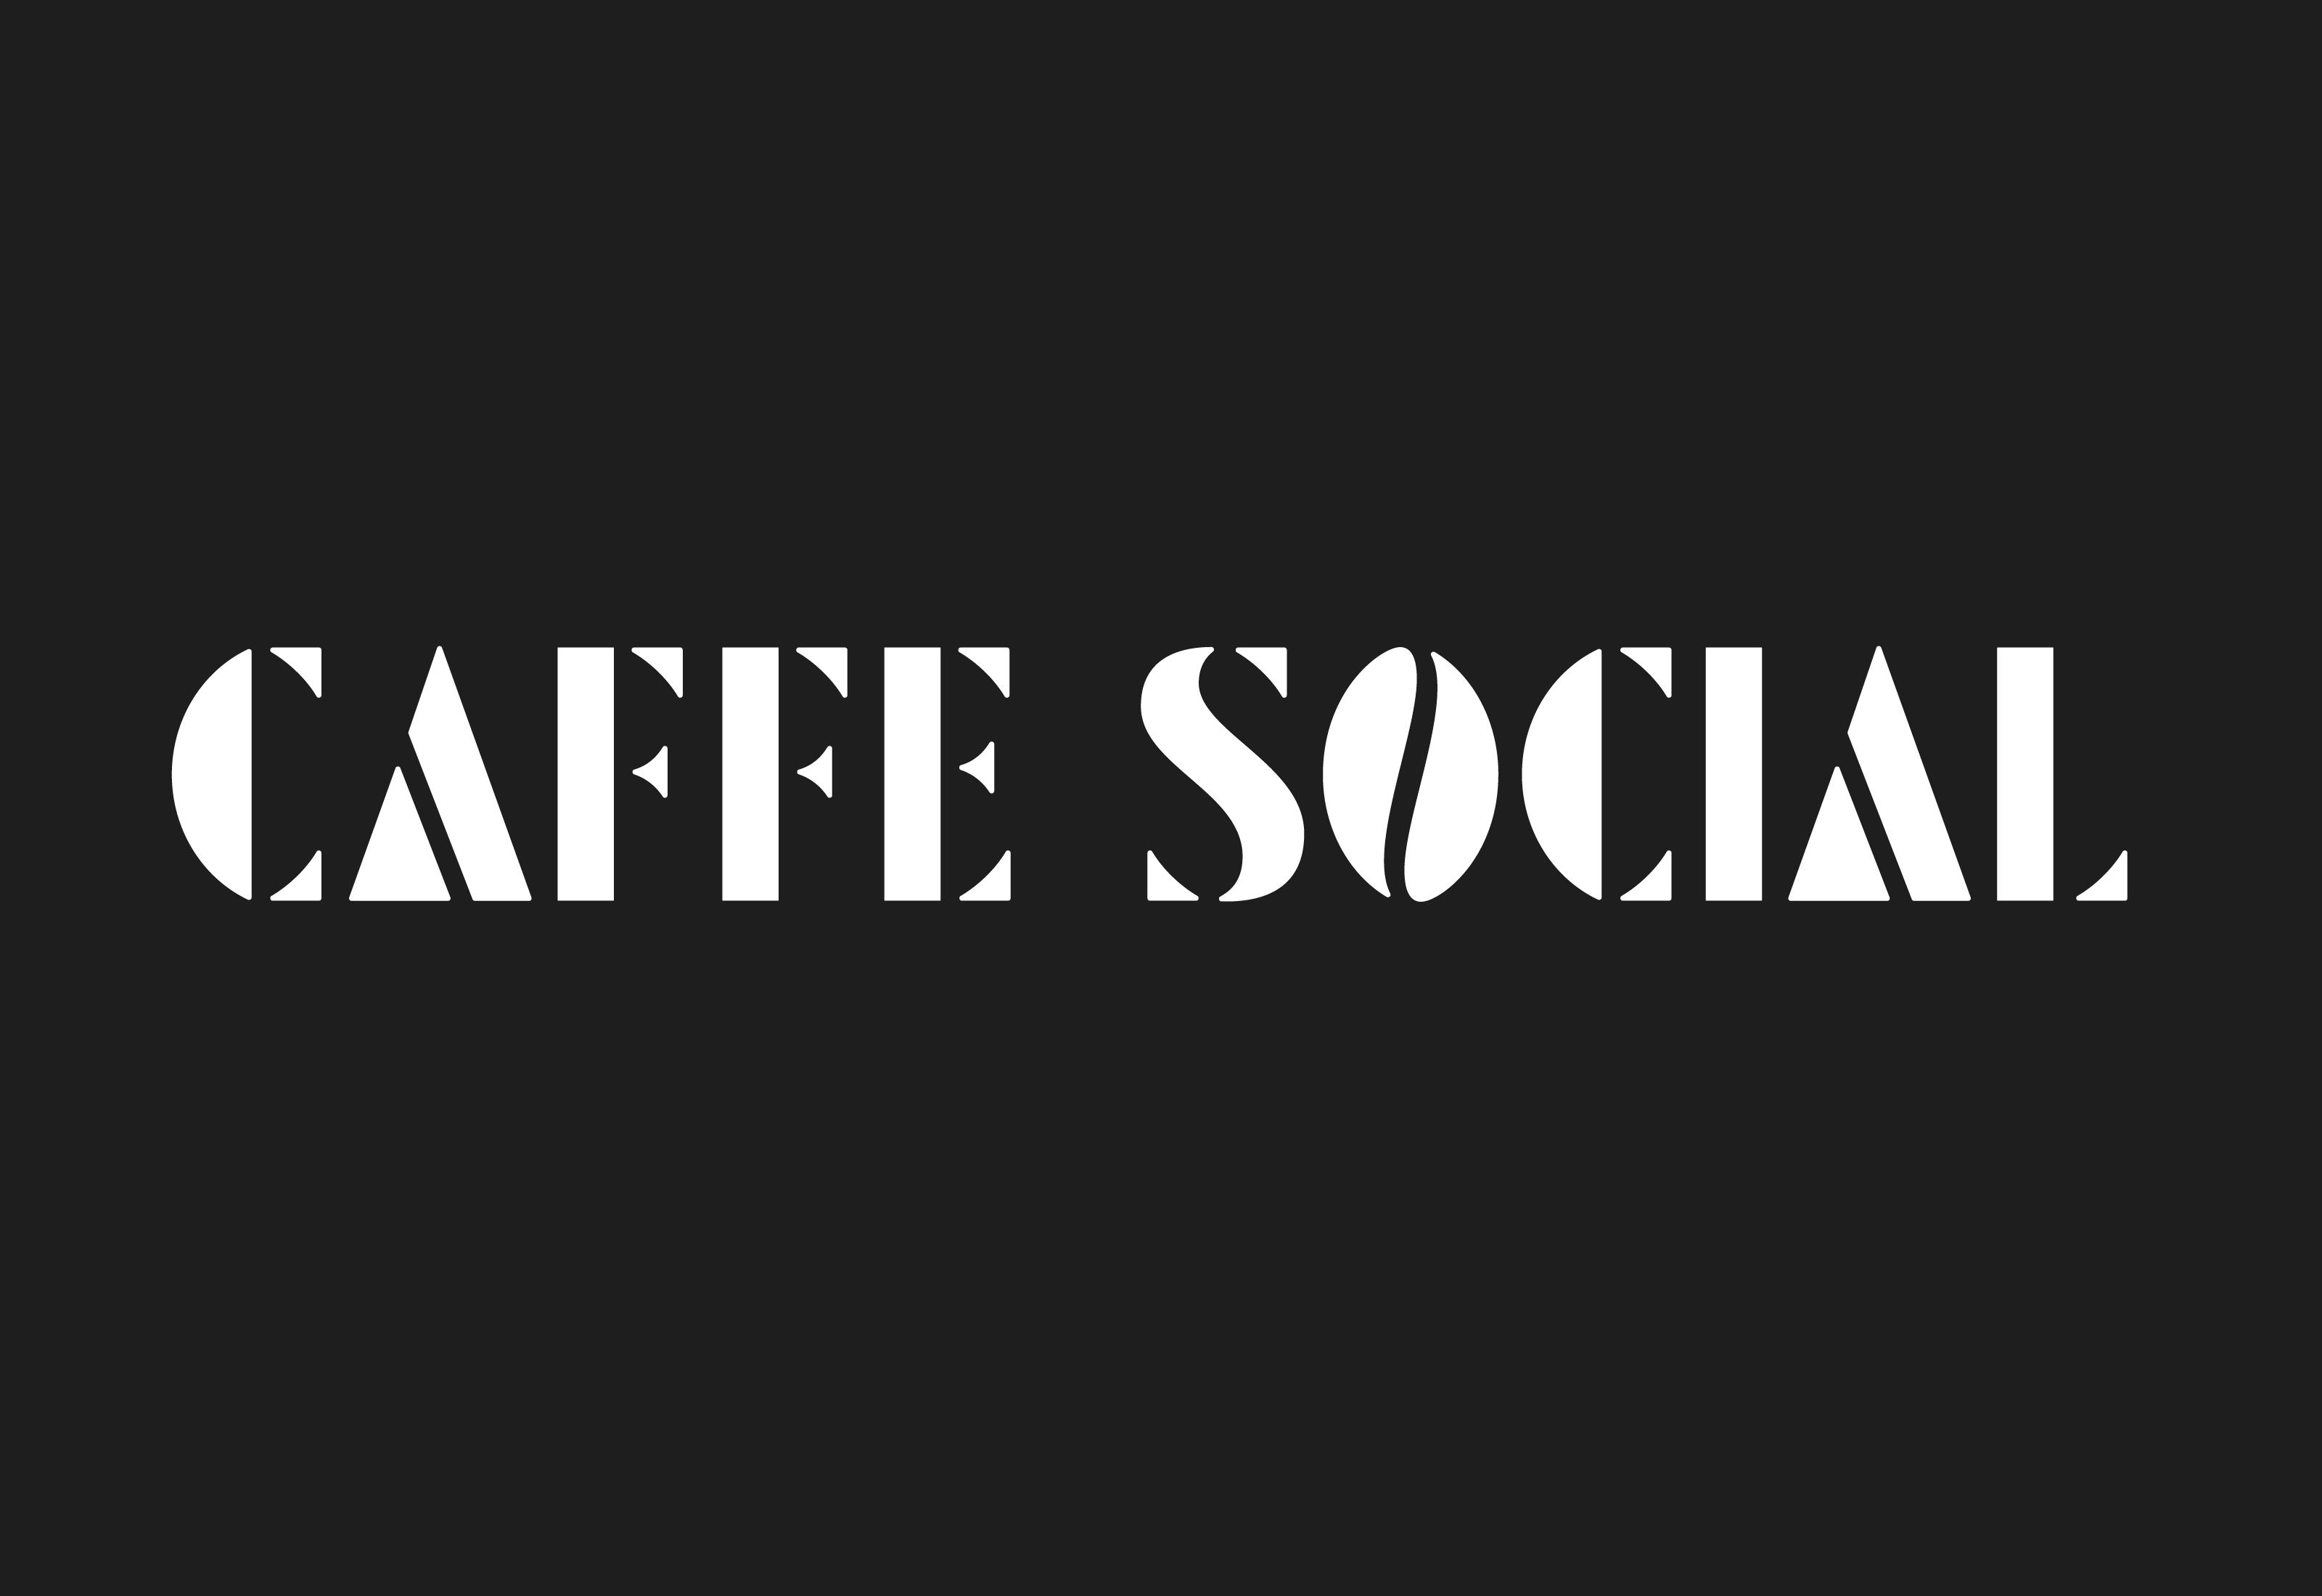 Caffe-Social-3-3200